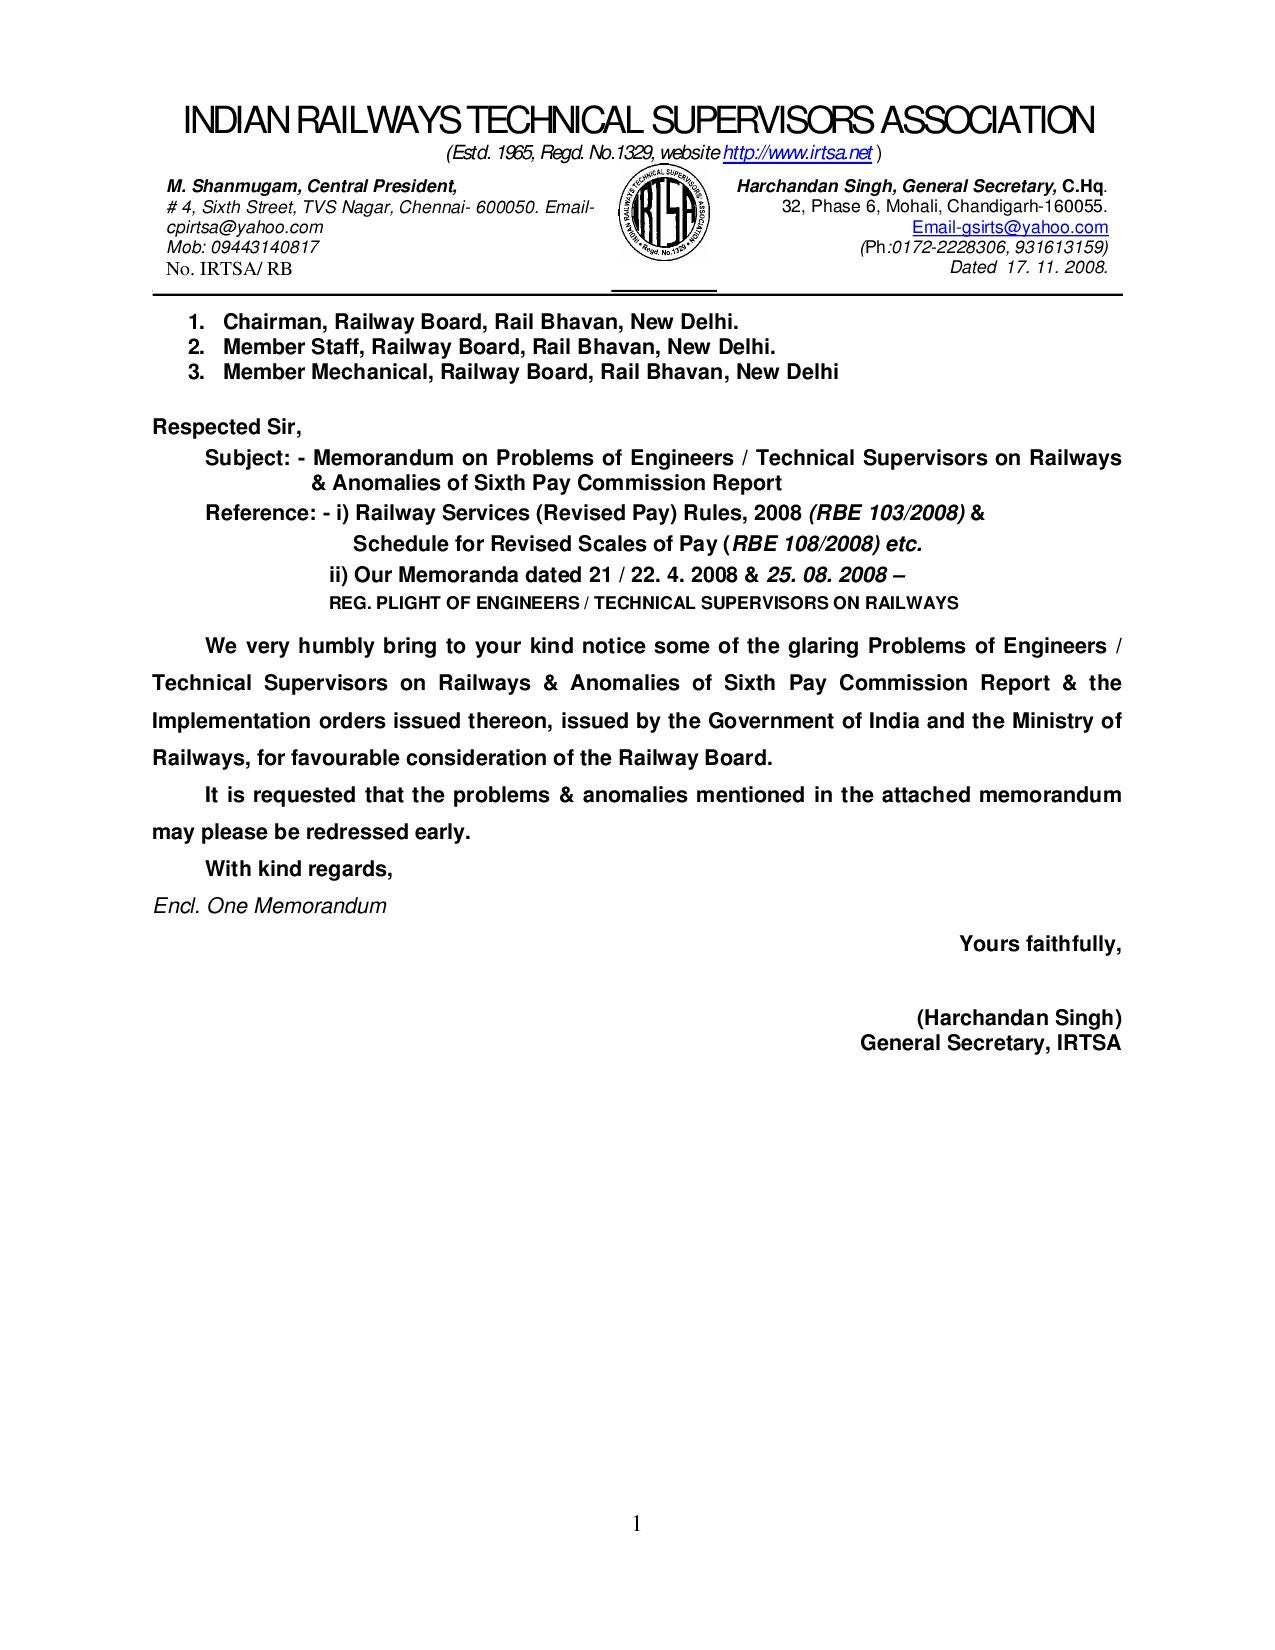 IRTSA Memorandum To Member Staff By Navtej Singh